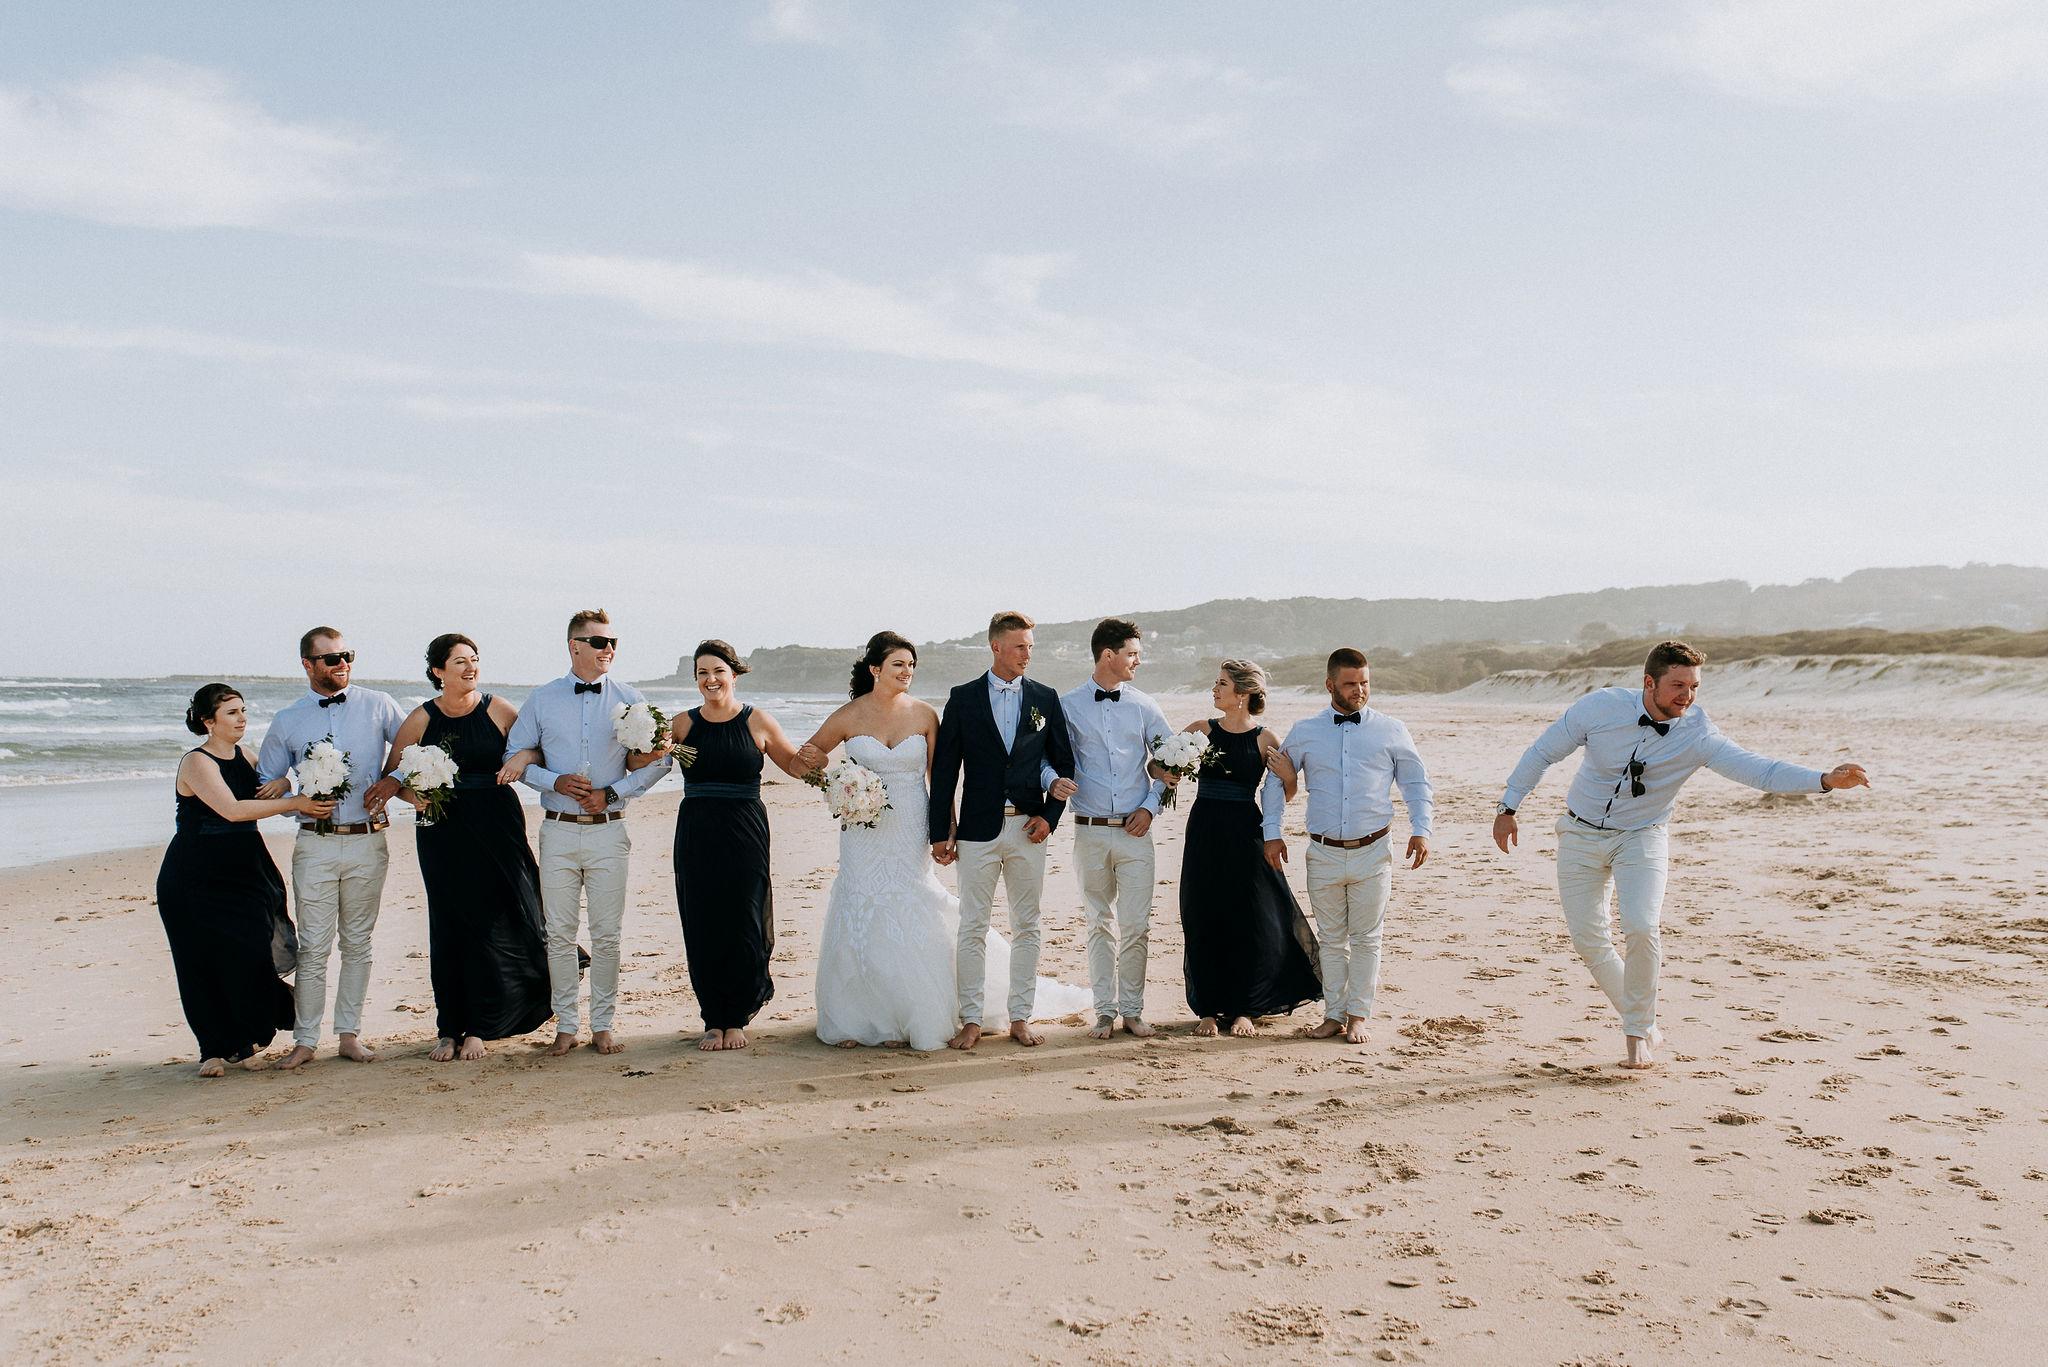 CAVES-BEACH-HOTEL-WEDDING-PATTEN-938.jpg